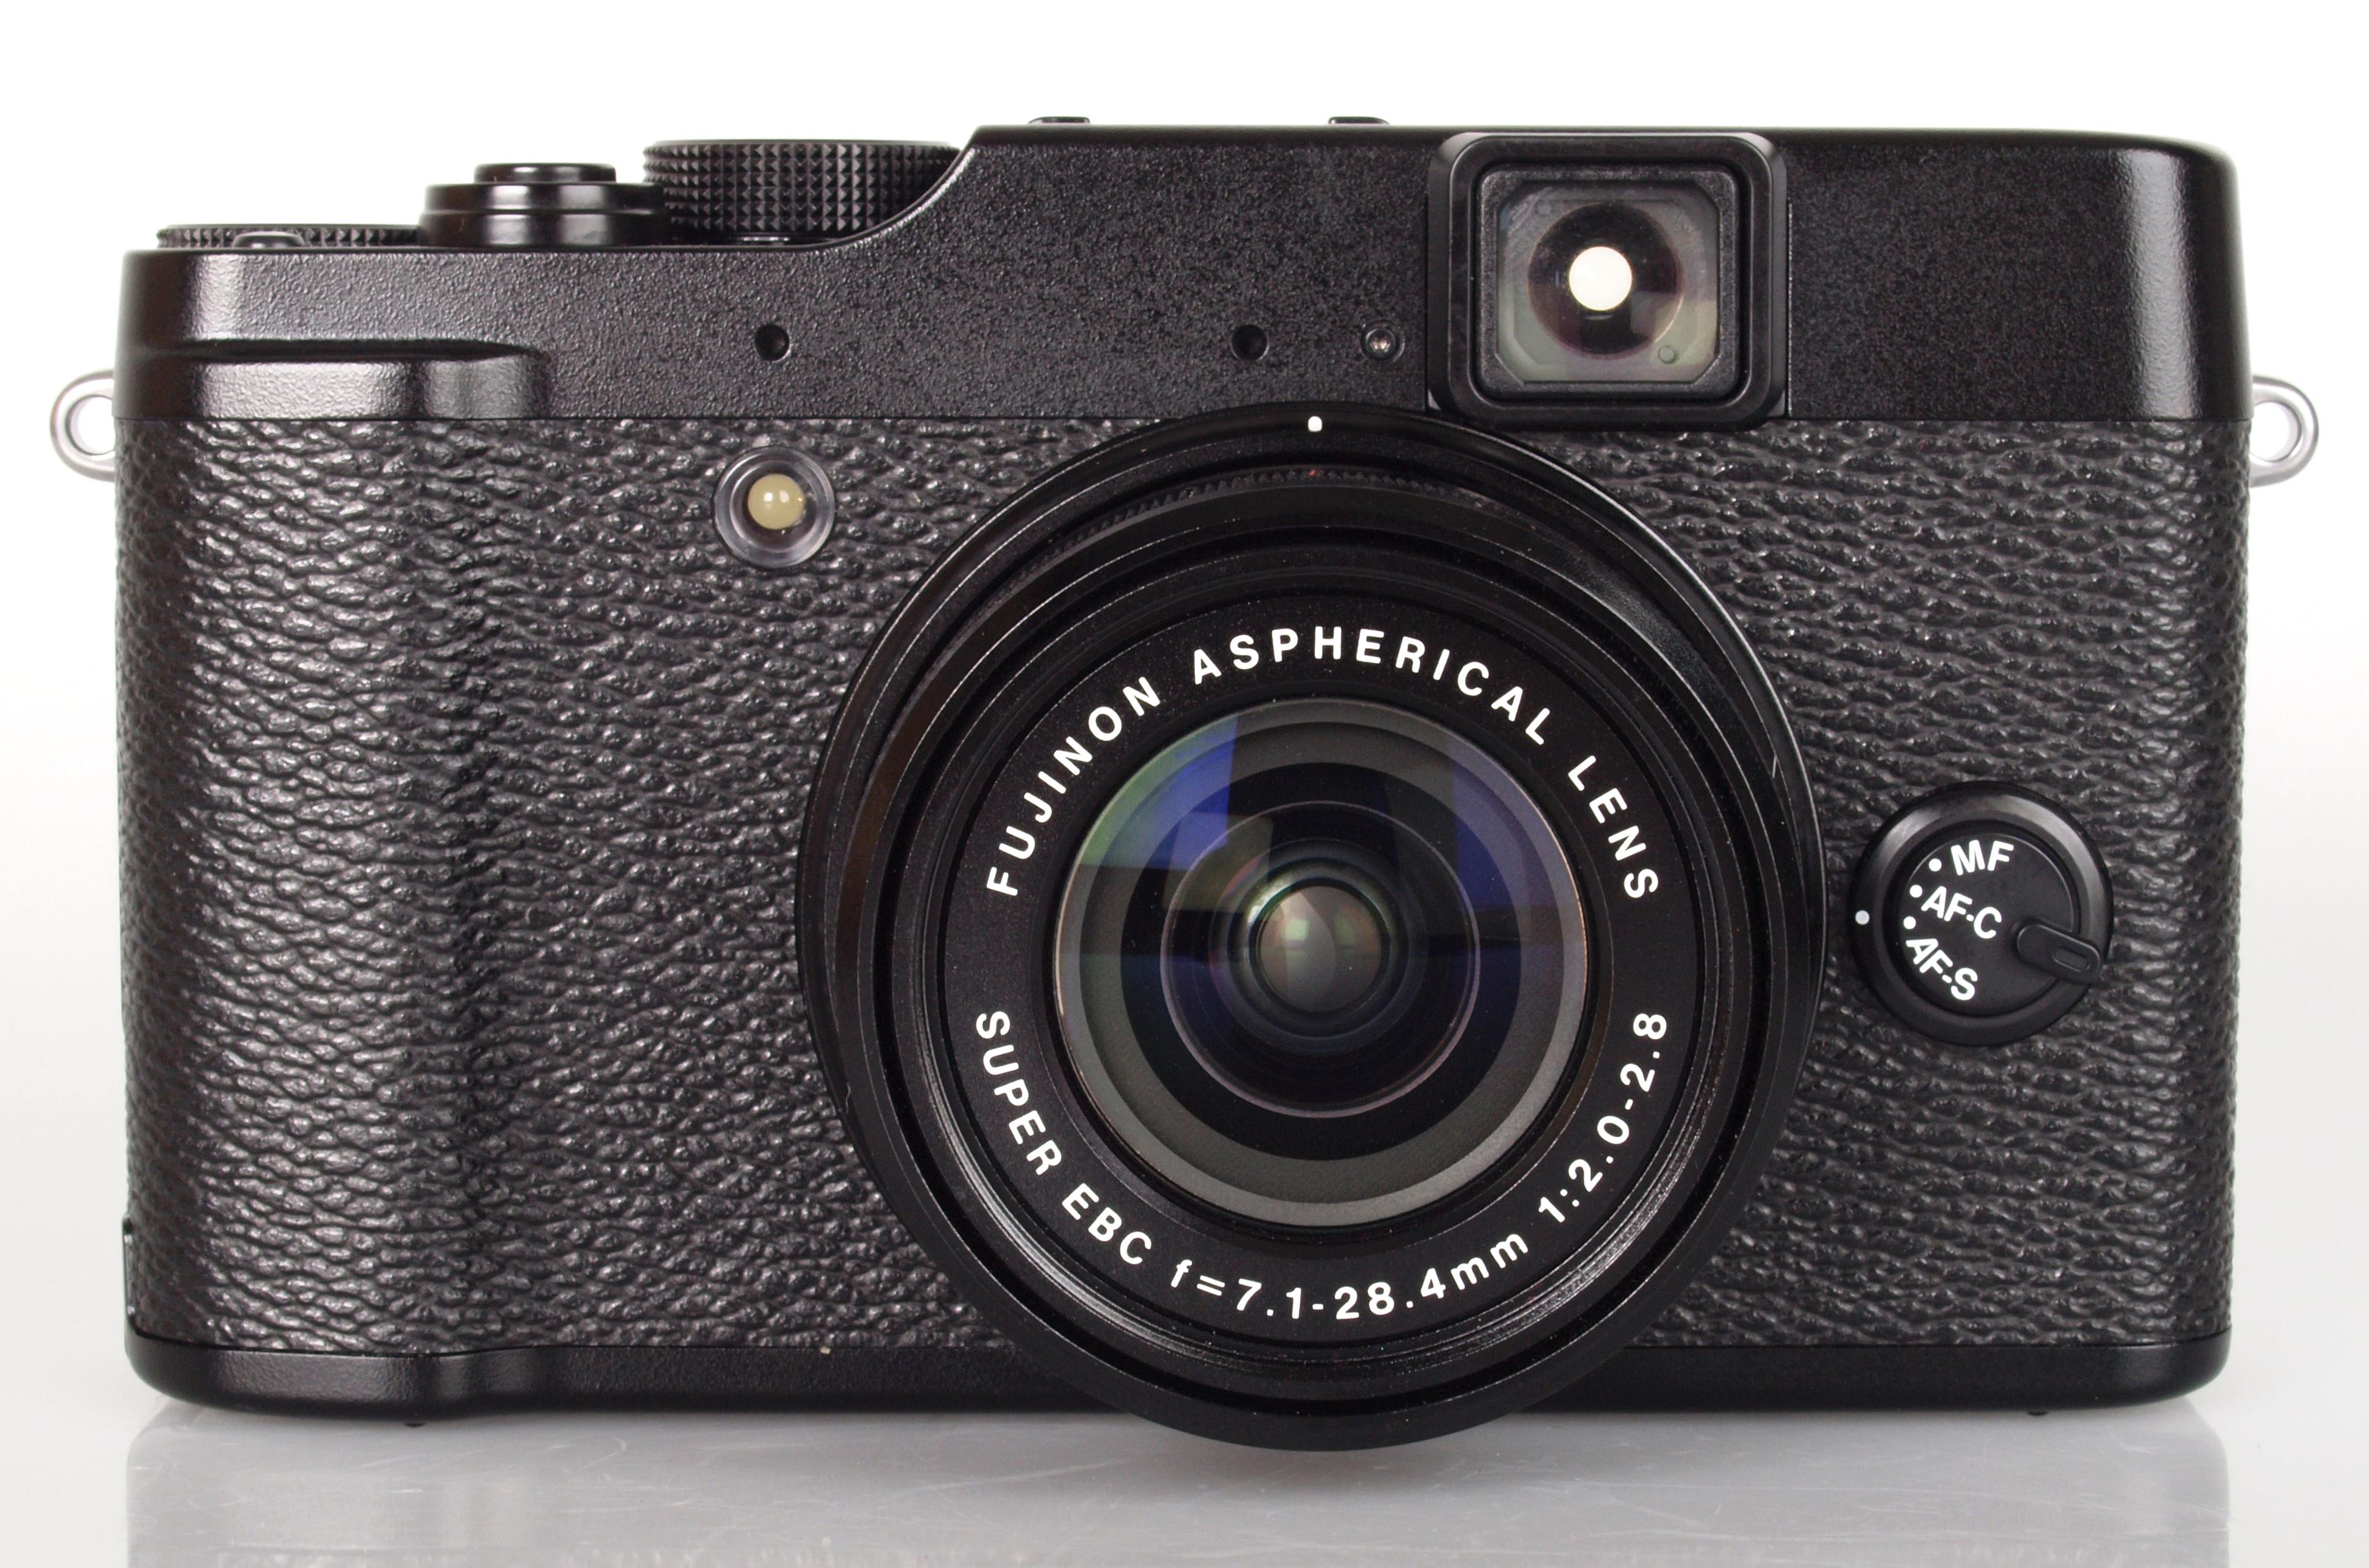 Fujifilm Finepix X10 Serious Compact Review